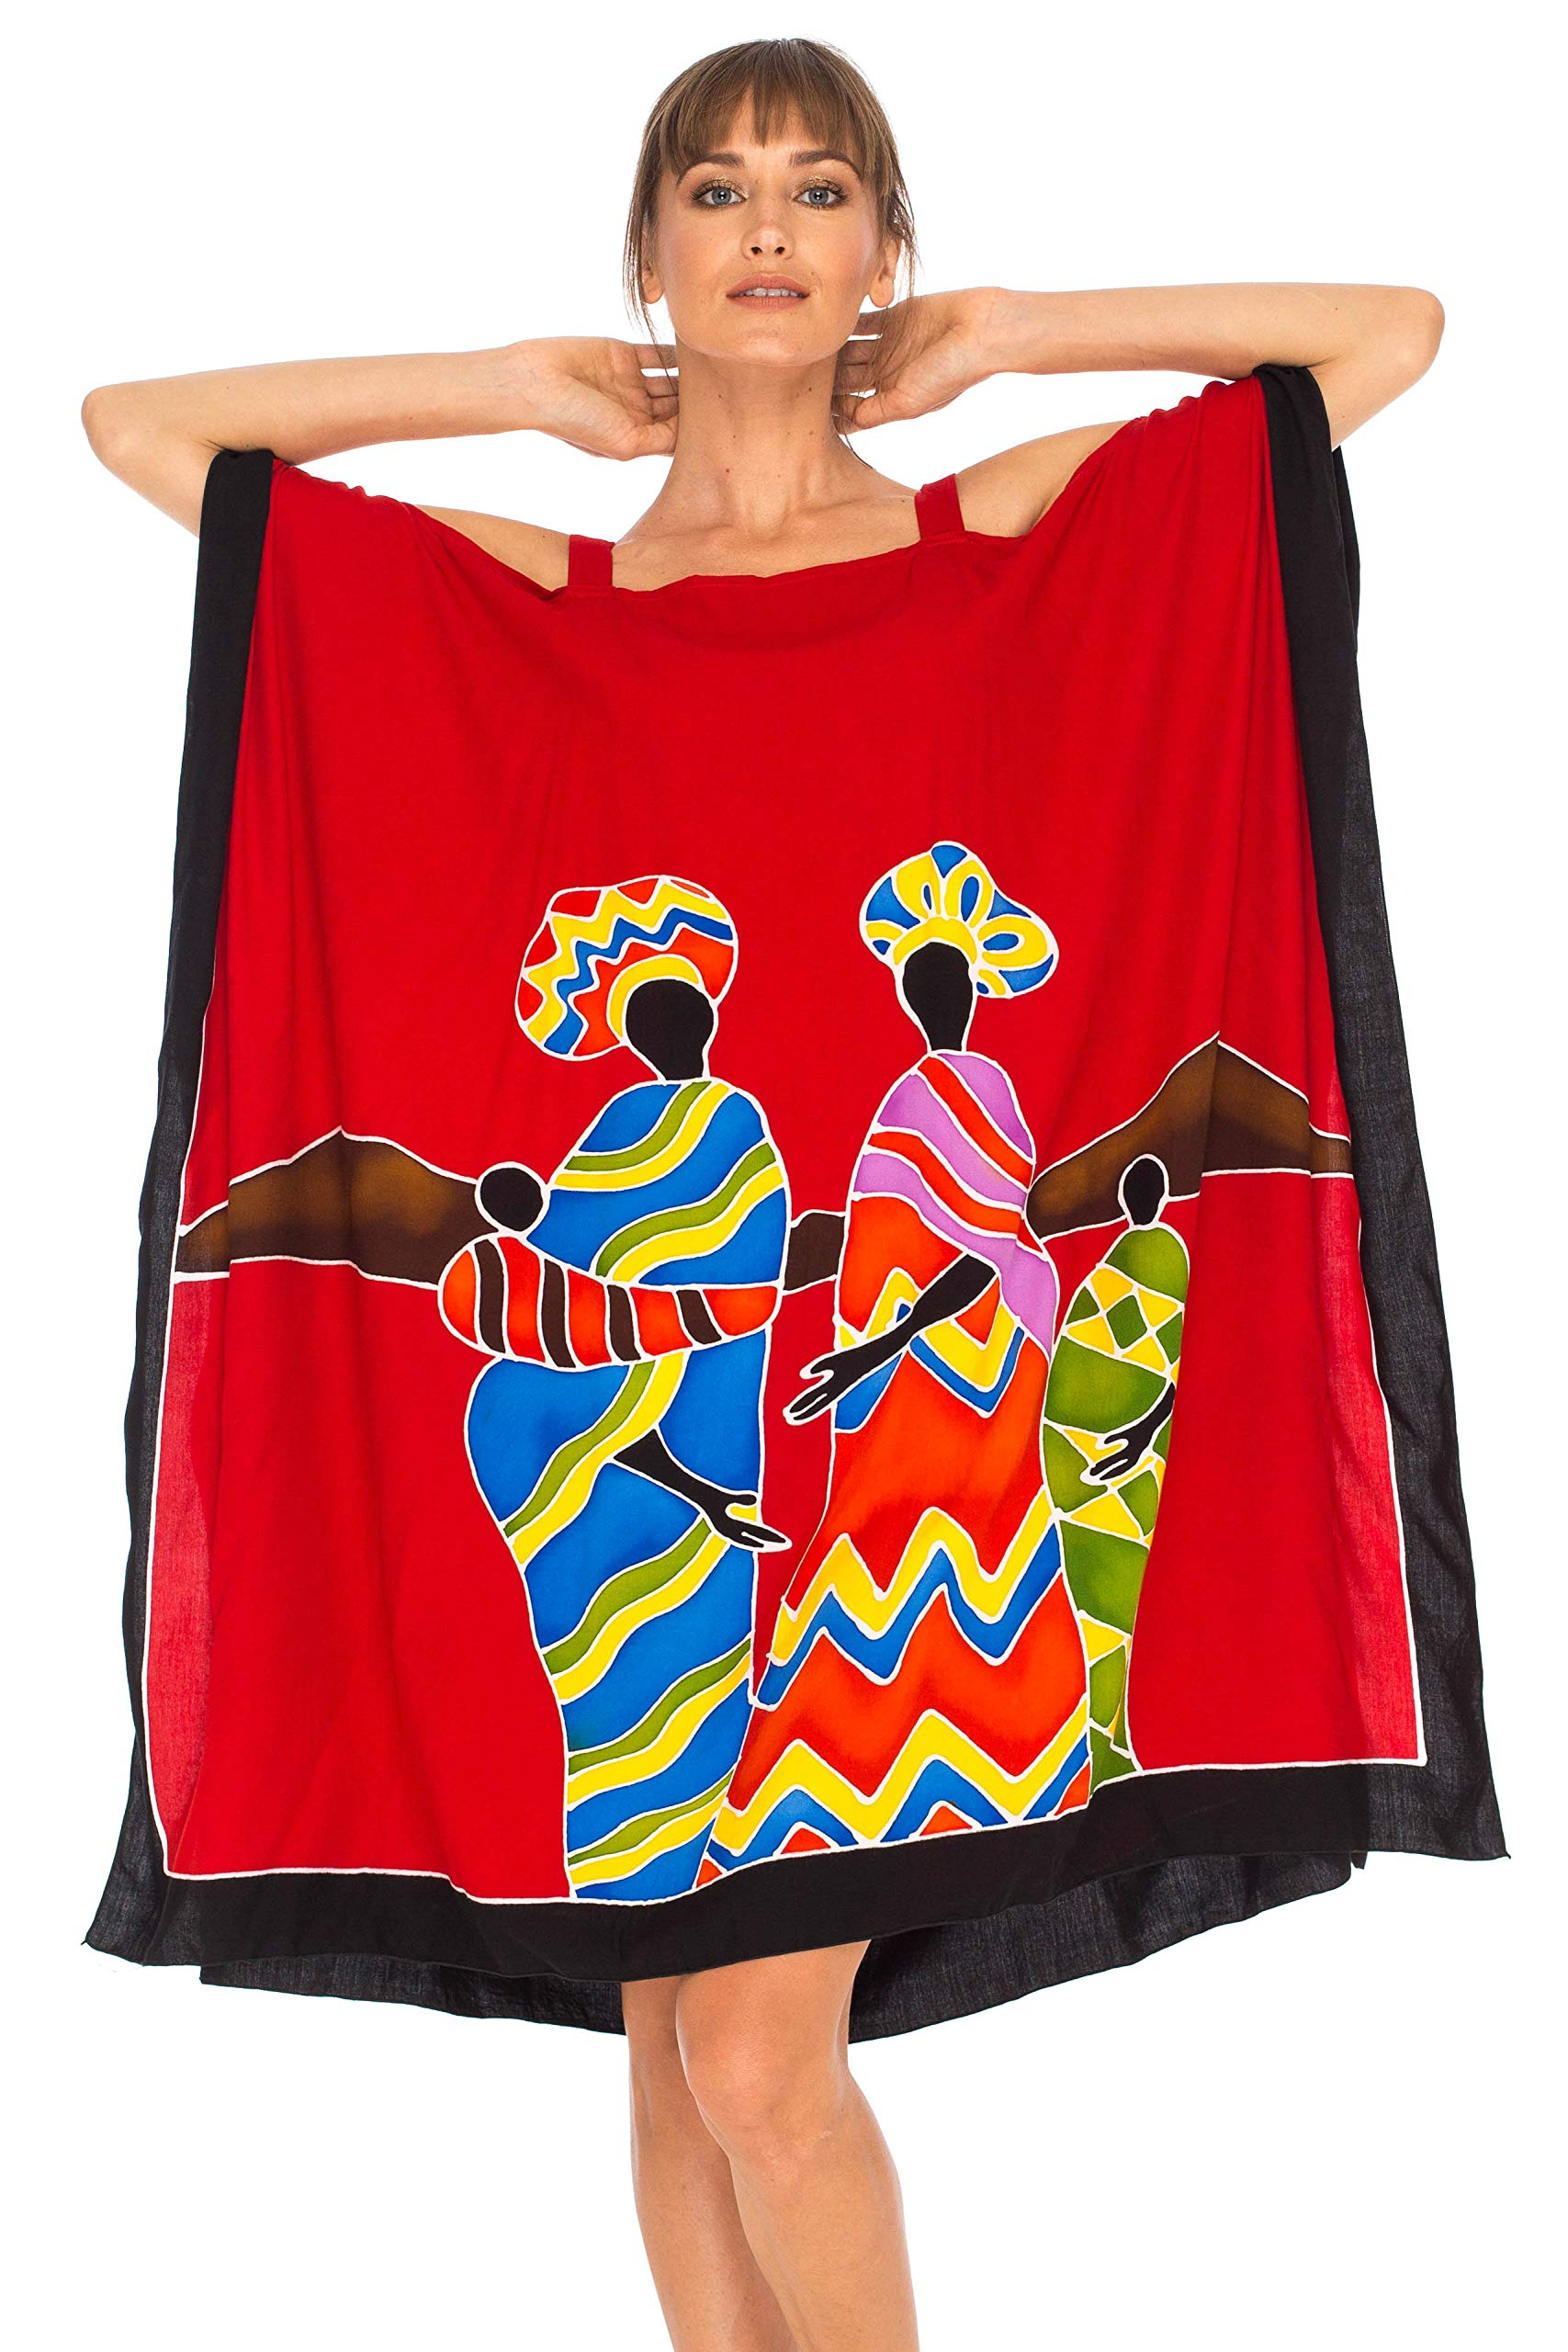 SHU-SHI Womens Poncho Dress Kaftan Cold Shoulder Short Tribal Tunic Swimwear Cover Up Plus Size Kaftan Dress Hand Painted Design Red